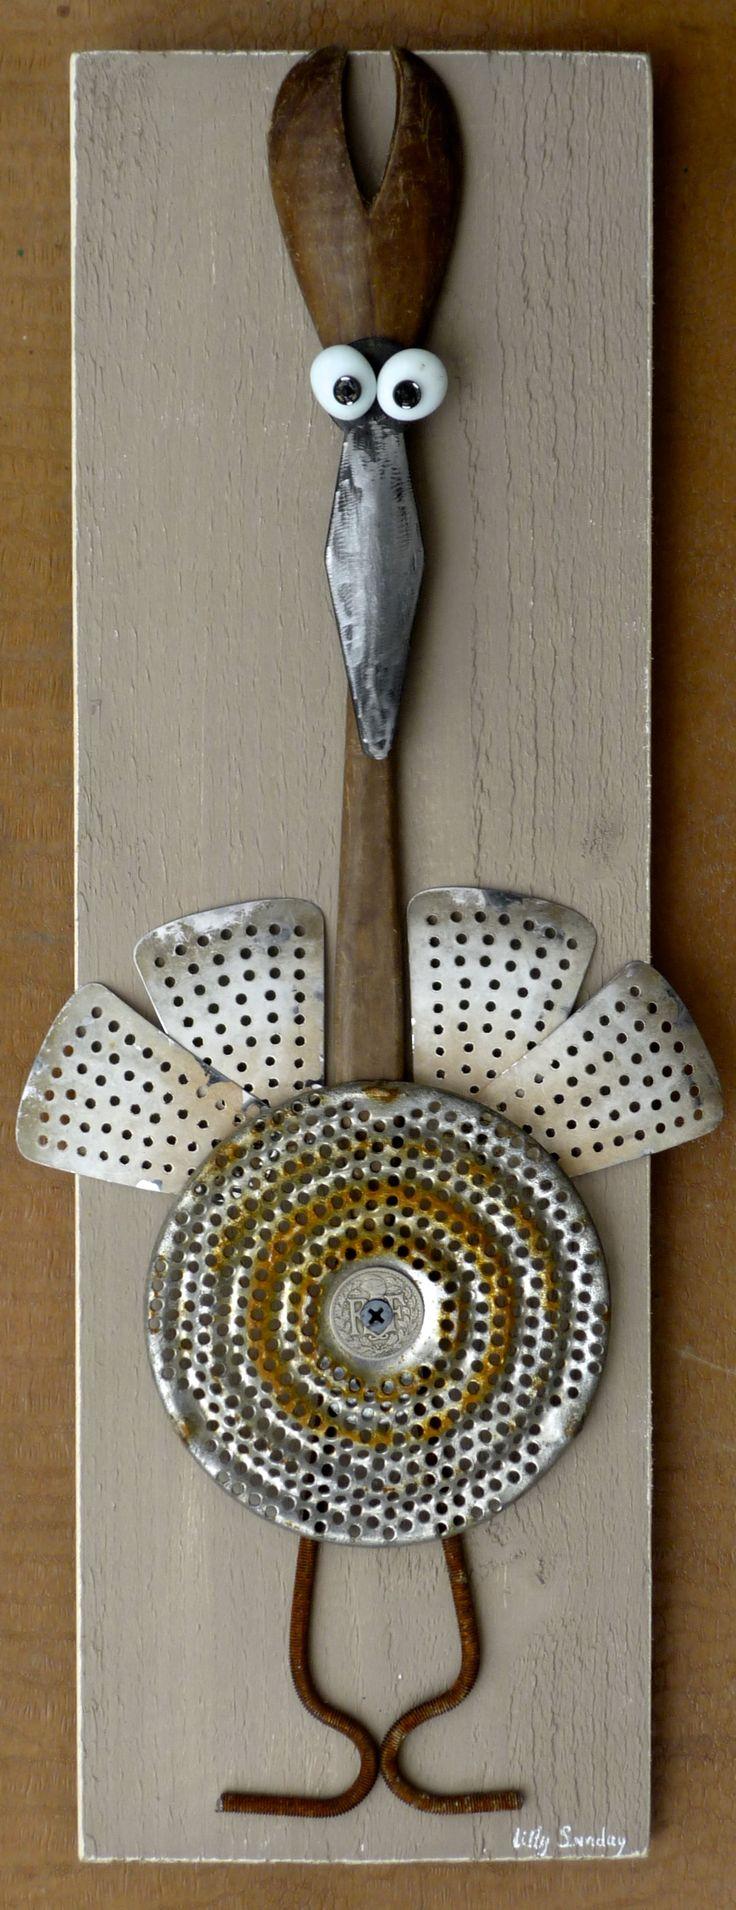 Wonderful bird made from old kitchen utensils, I love it!